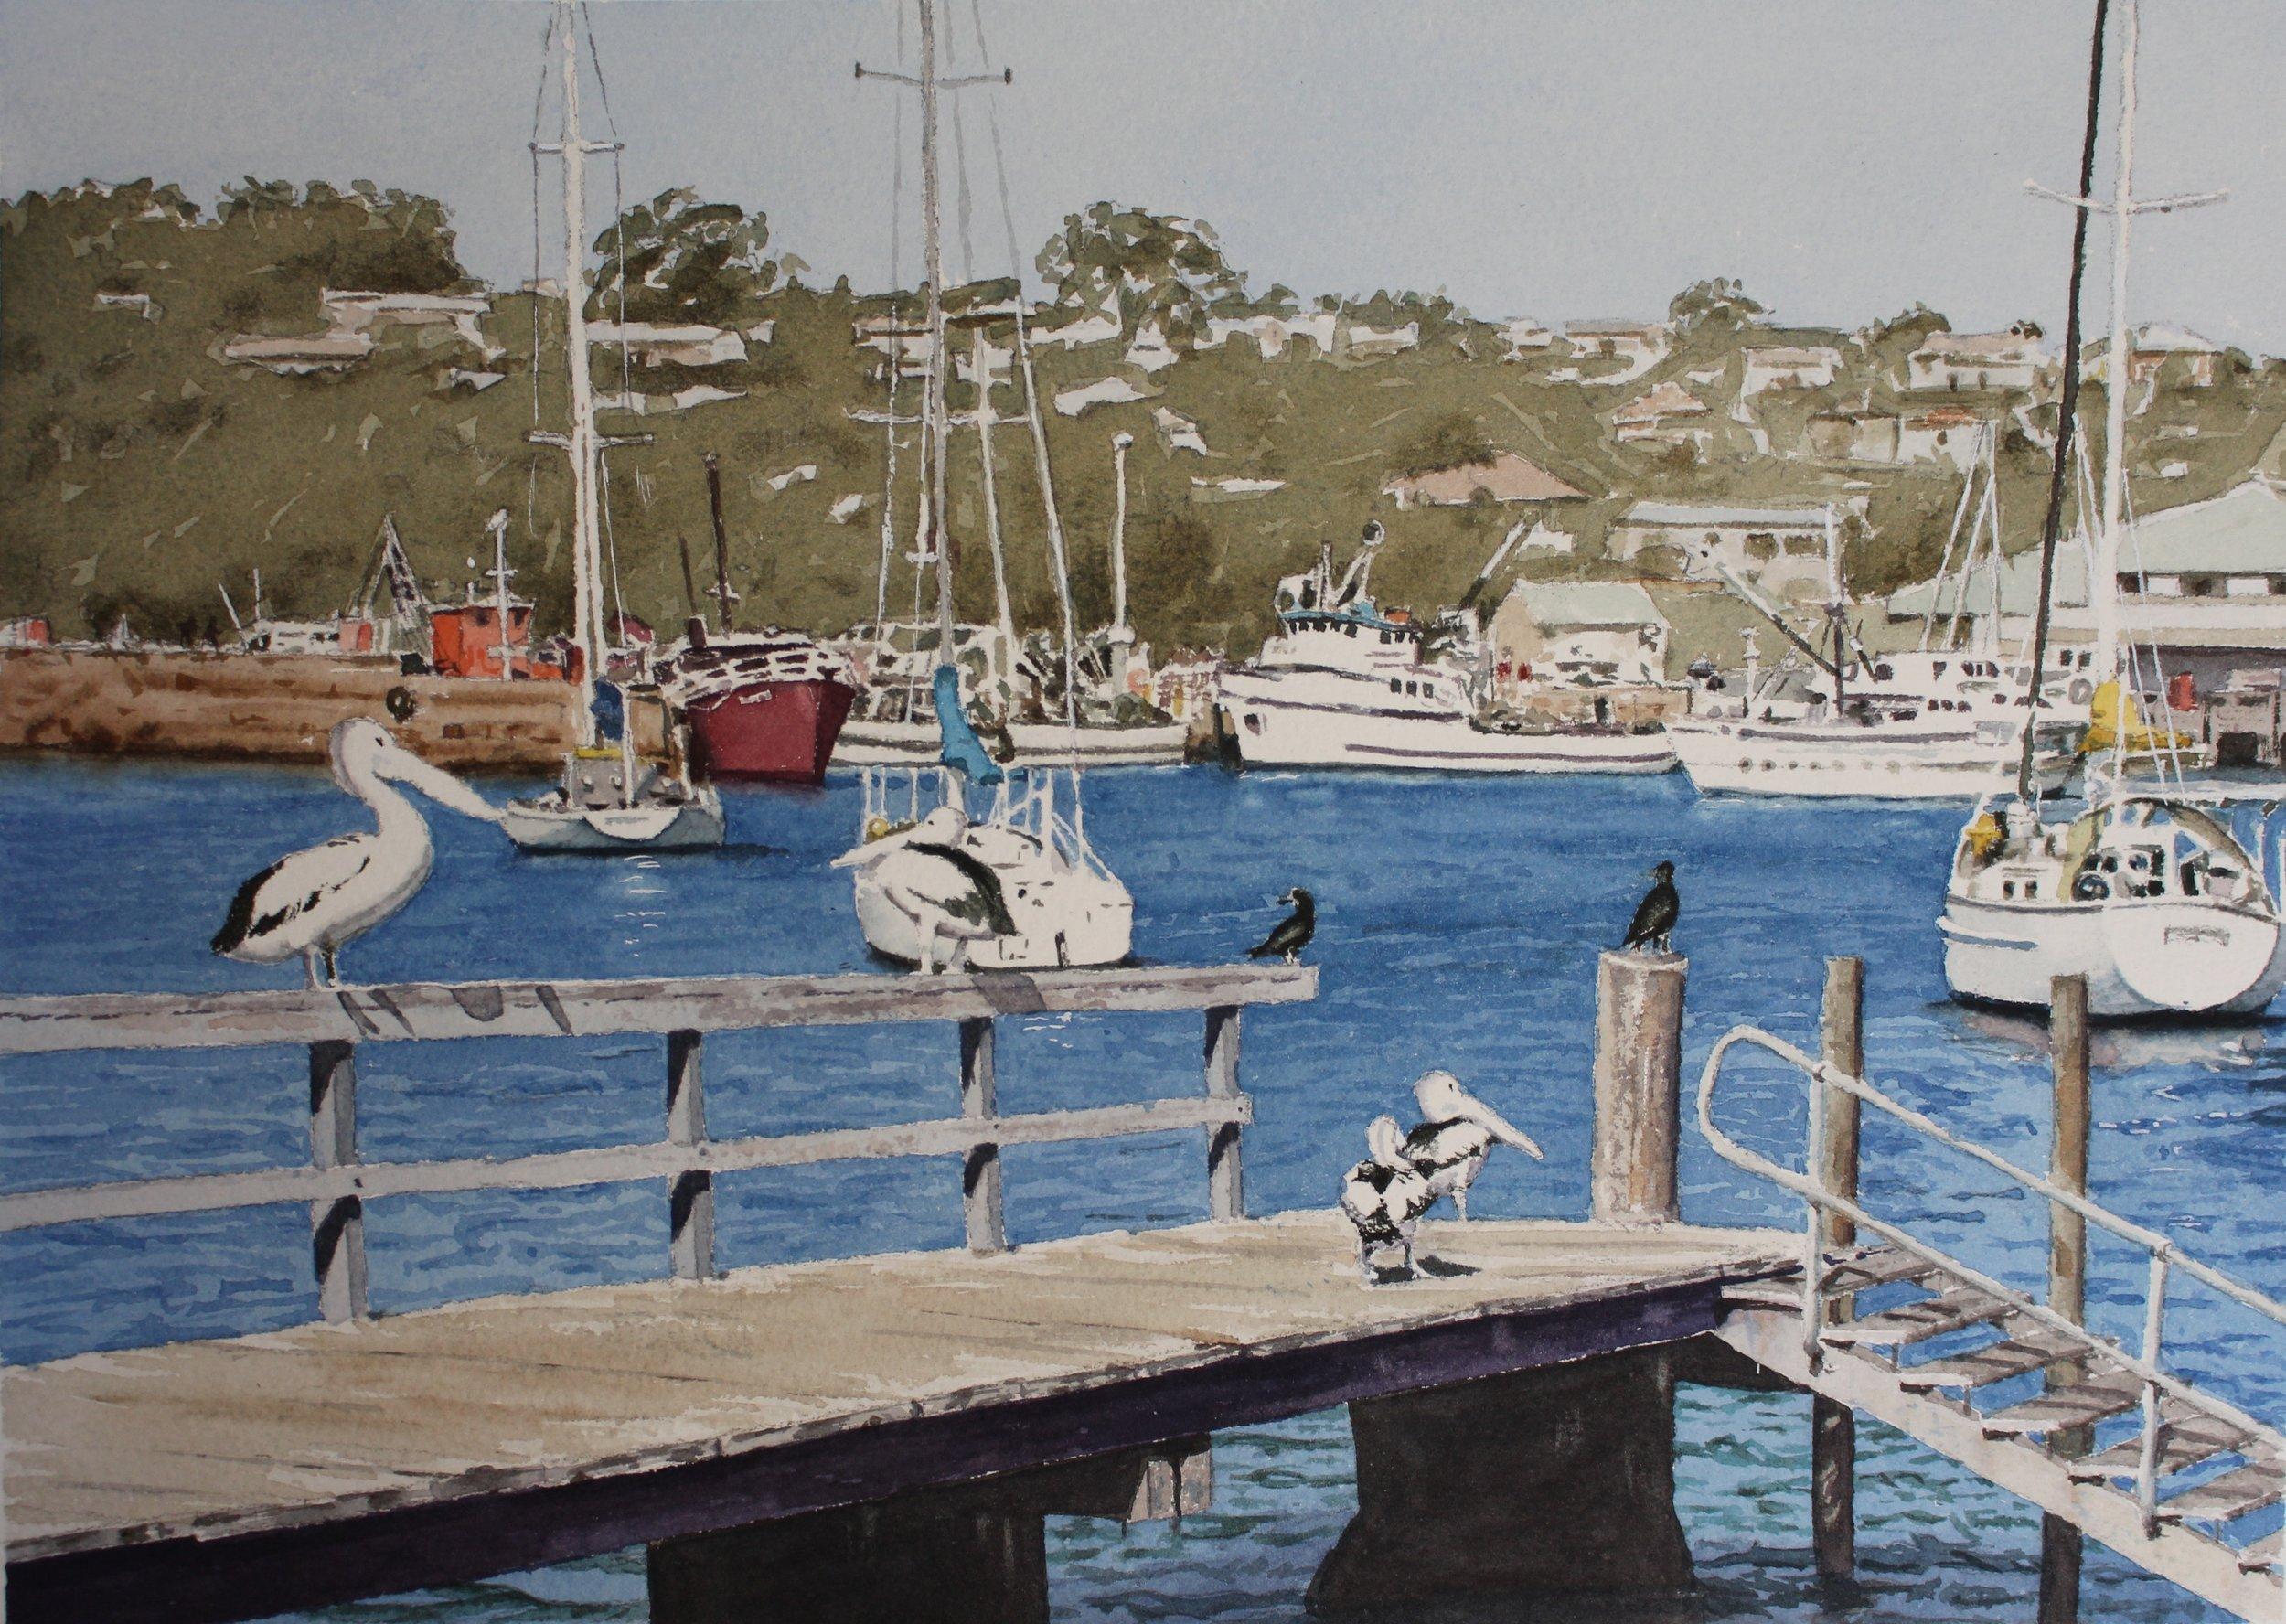 Ulladulla Harbour, NSW South Coast